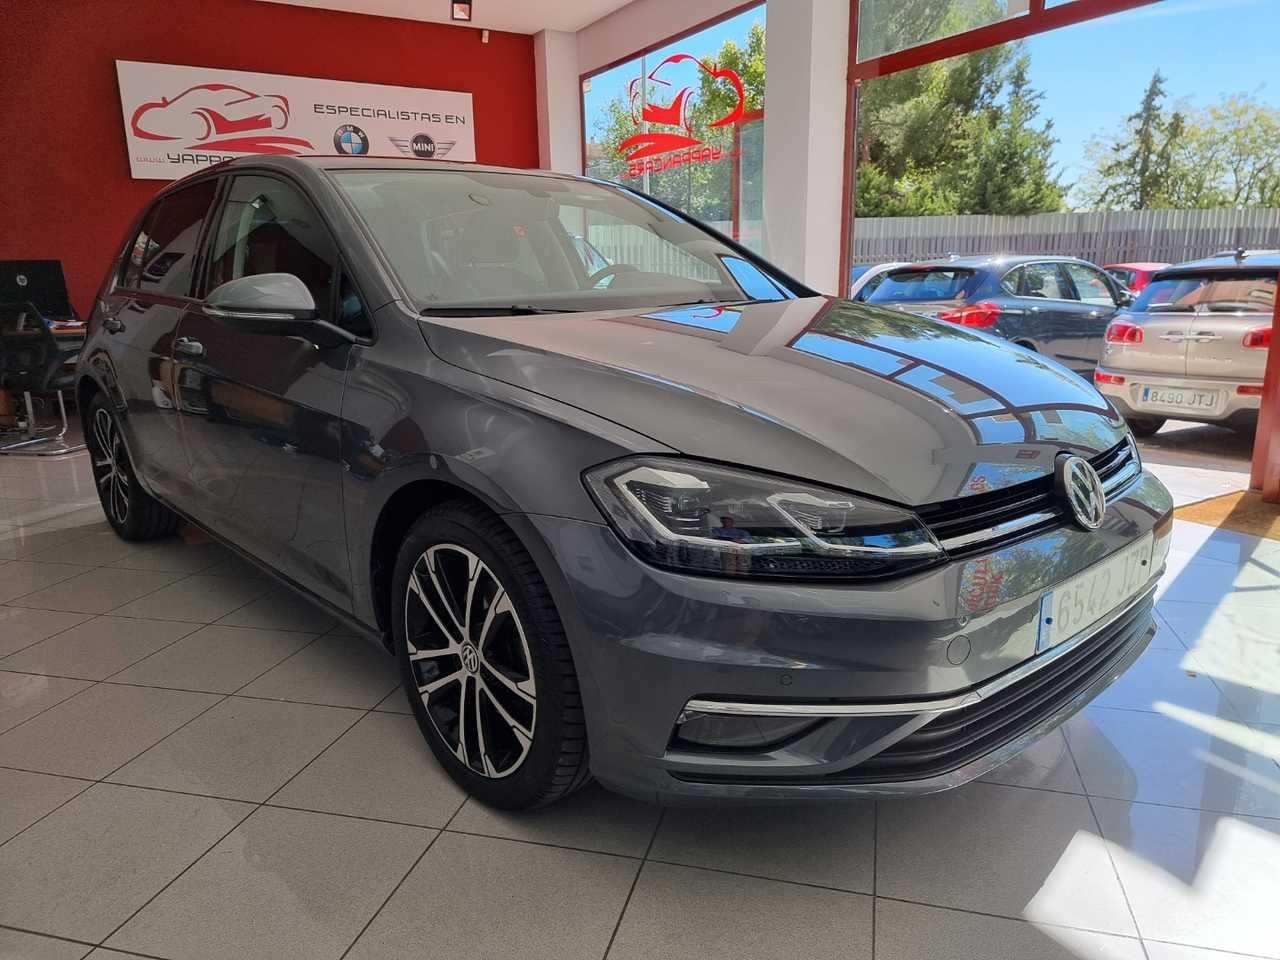 Volkswagen Golf 2.0 TDI Sport 150 CV 5p.   - Foto 1